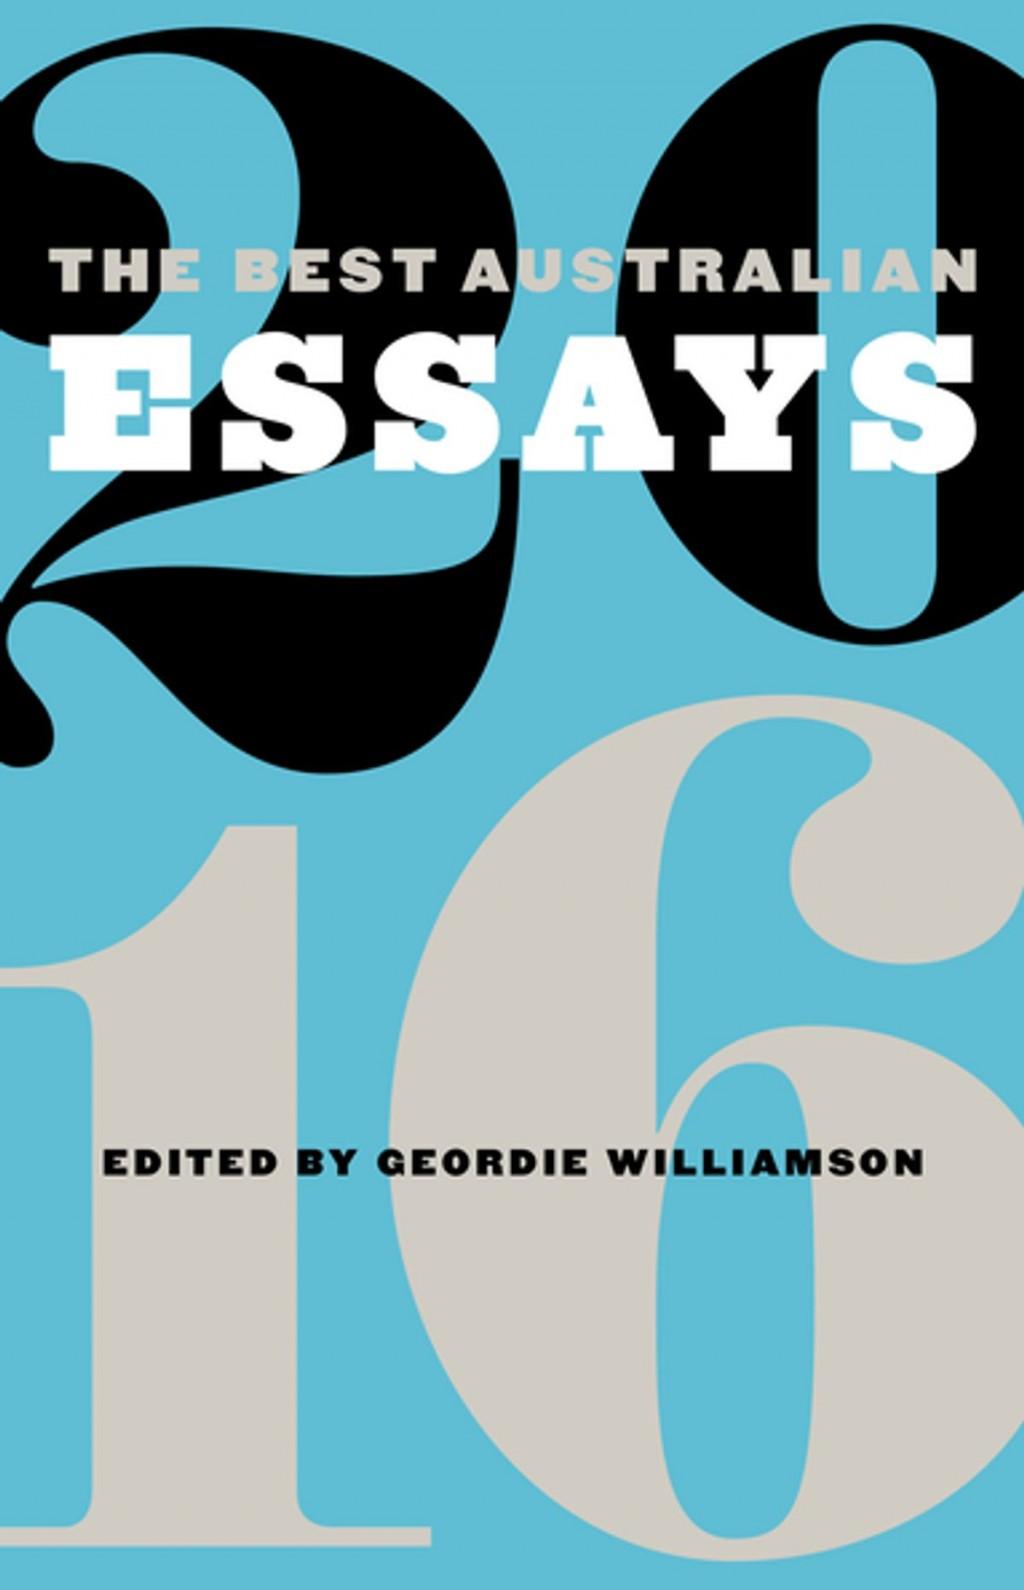 009 The Best Australian Essays Essay Breathtaking 2016 American Audiobook Short Pdf Large